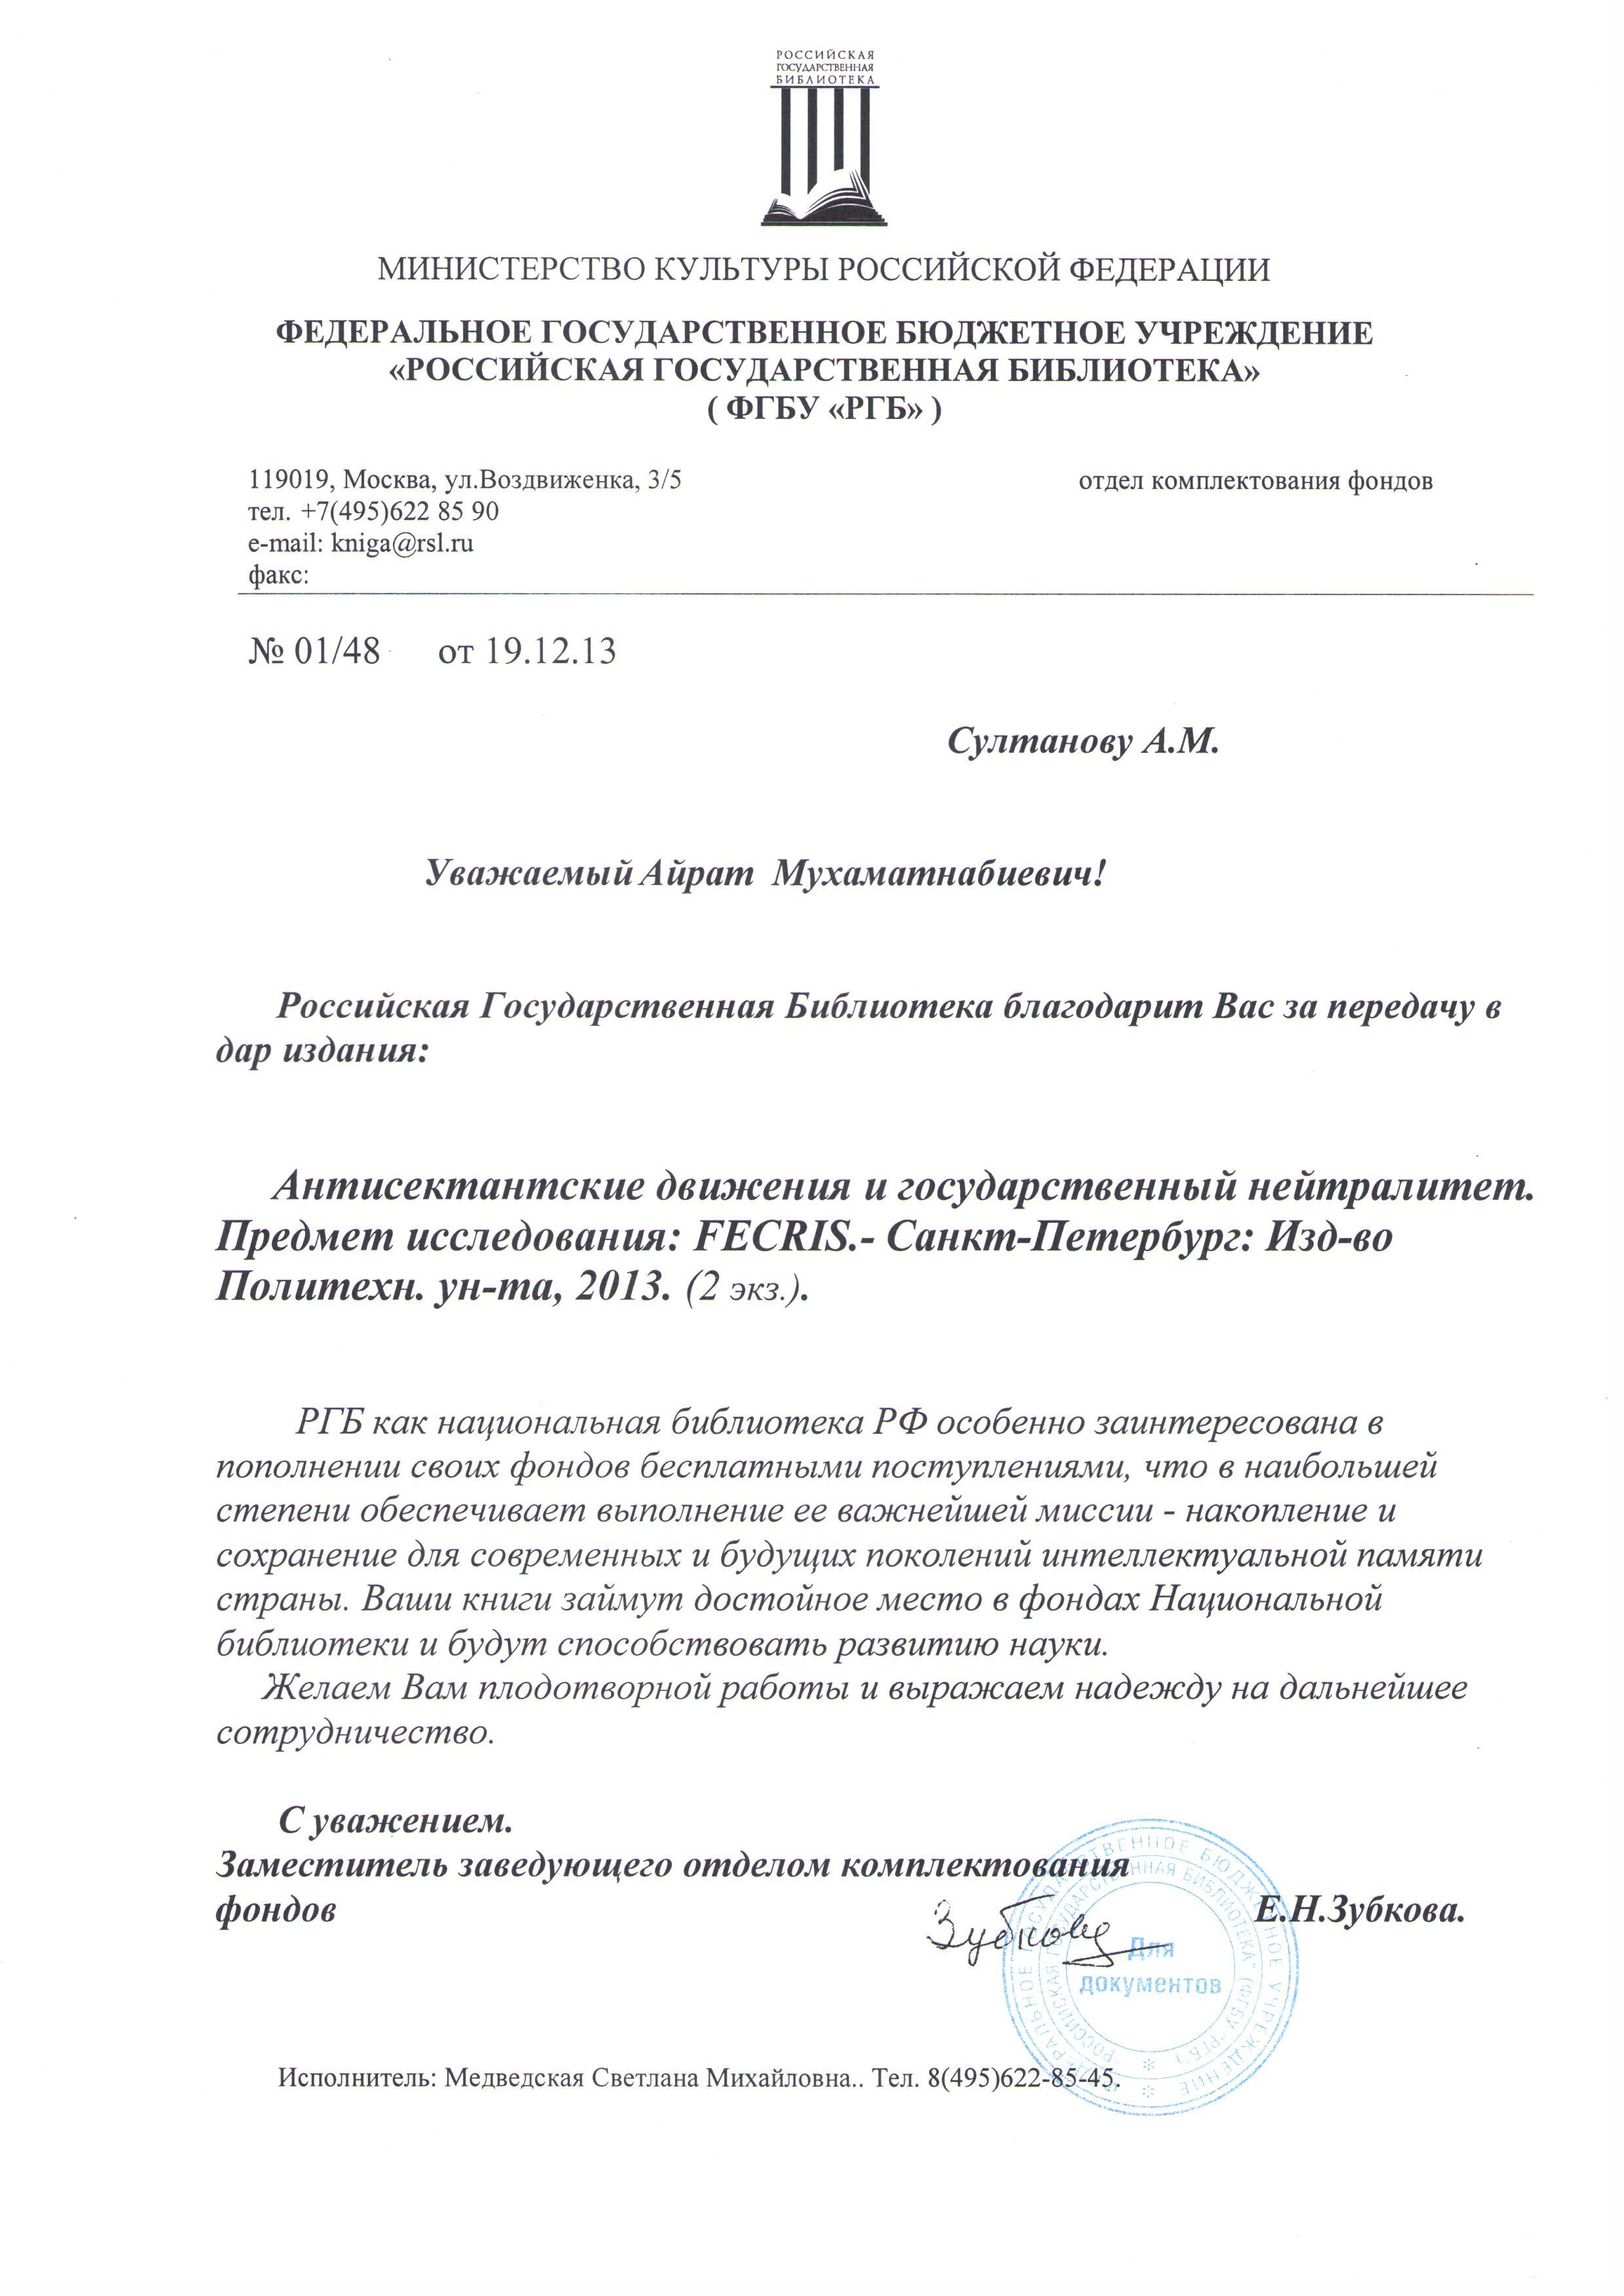 Commendation-RGB-19-12-2013.jpg